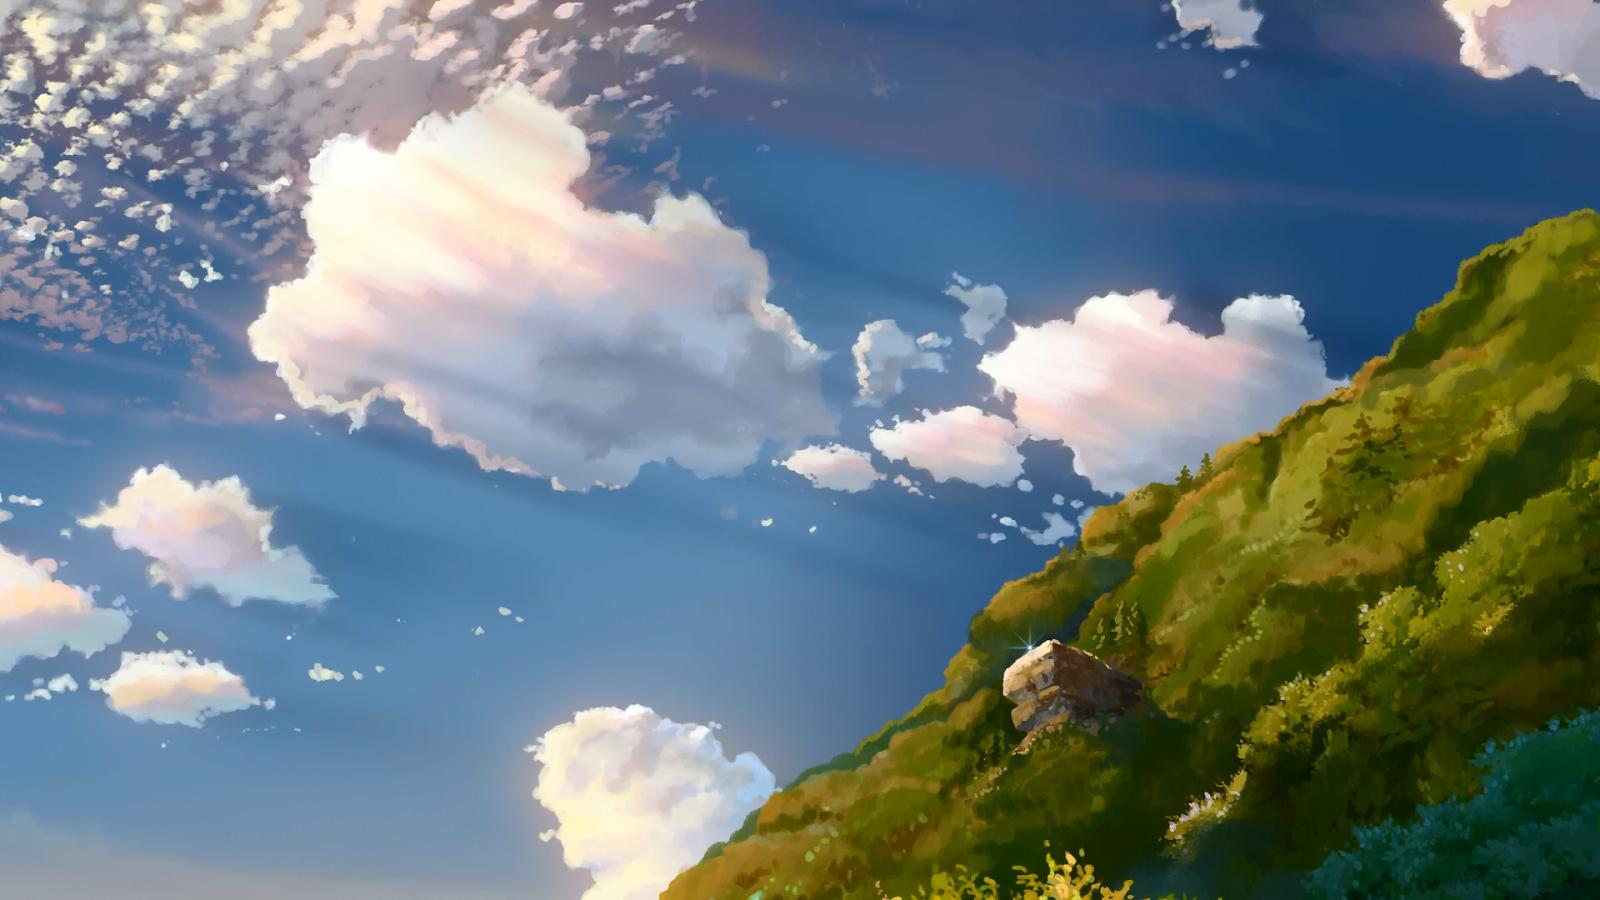 Sky (Anime Background)